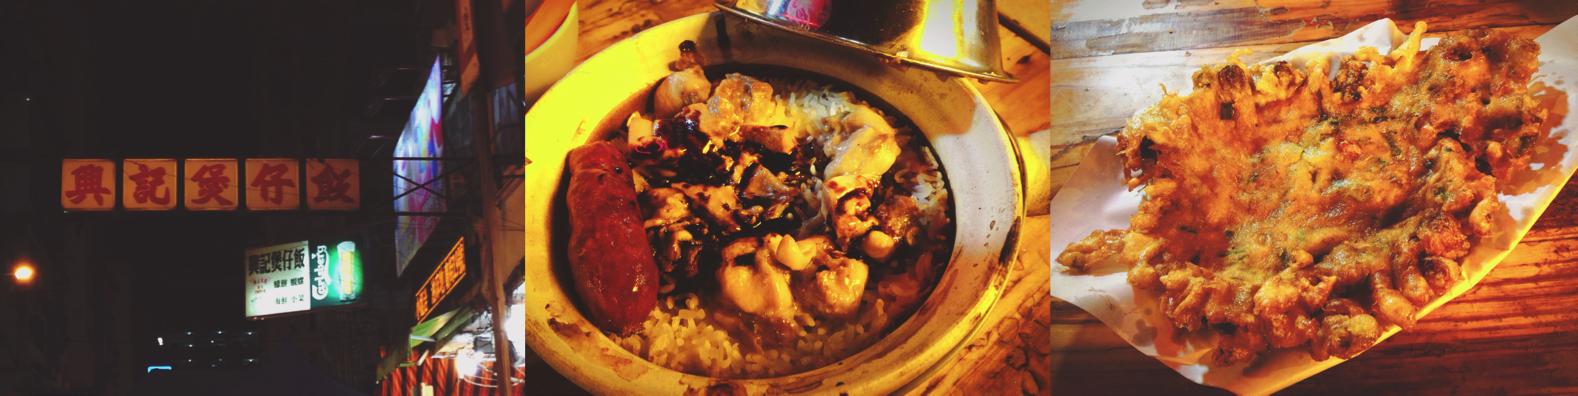 Hing Kee Claypot Rice Yau Ma Tei Hong Kong